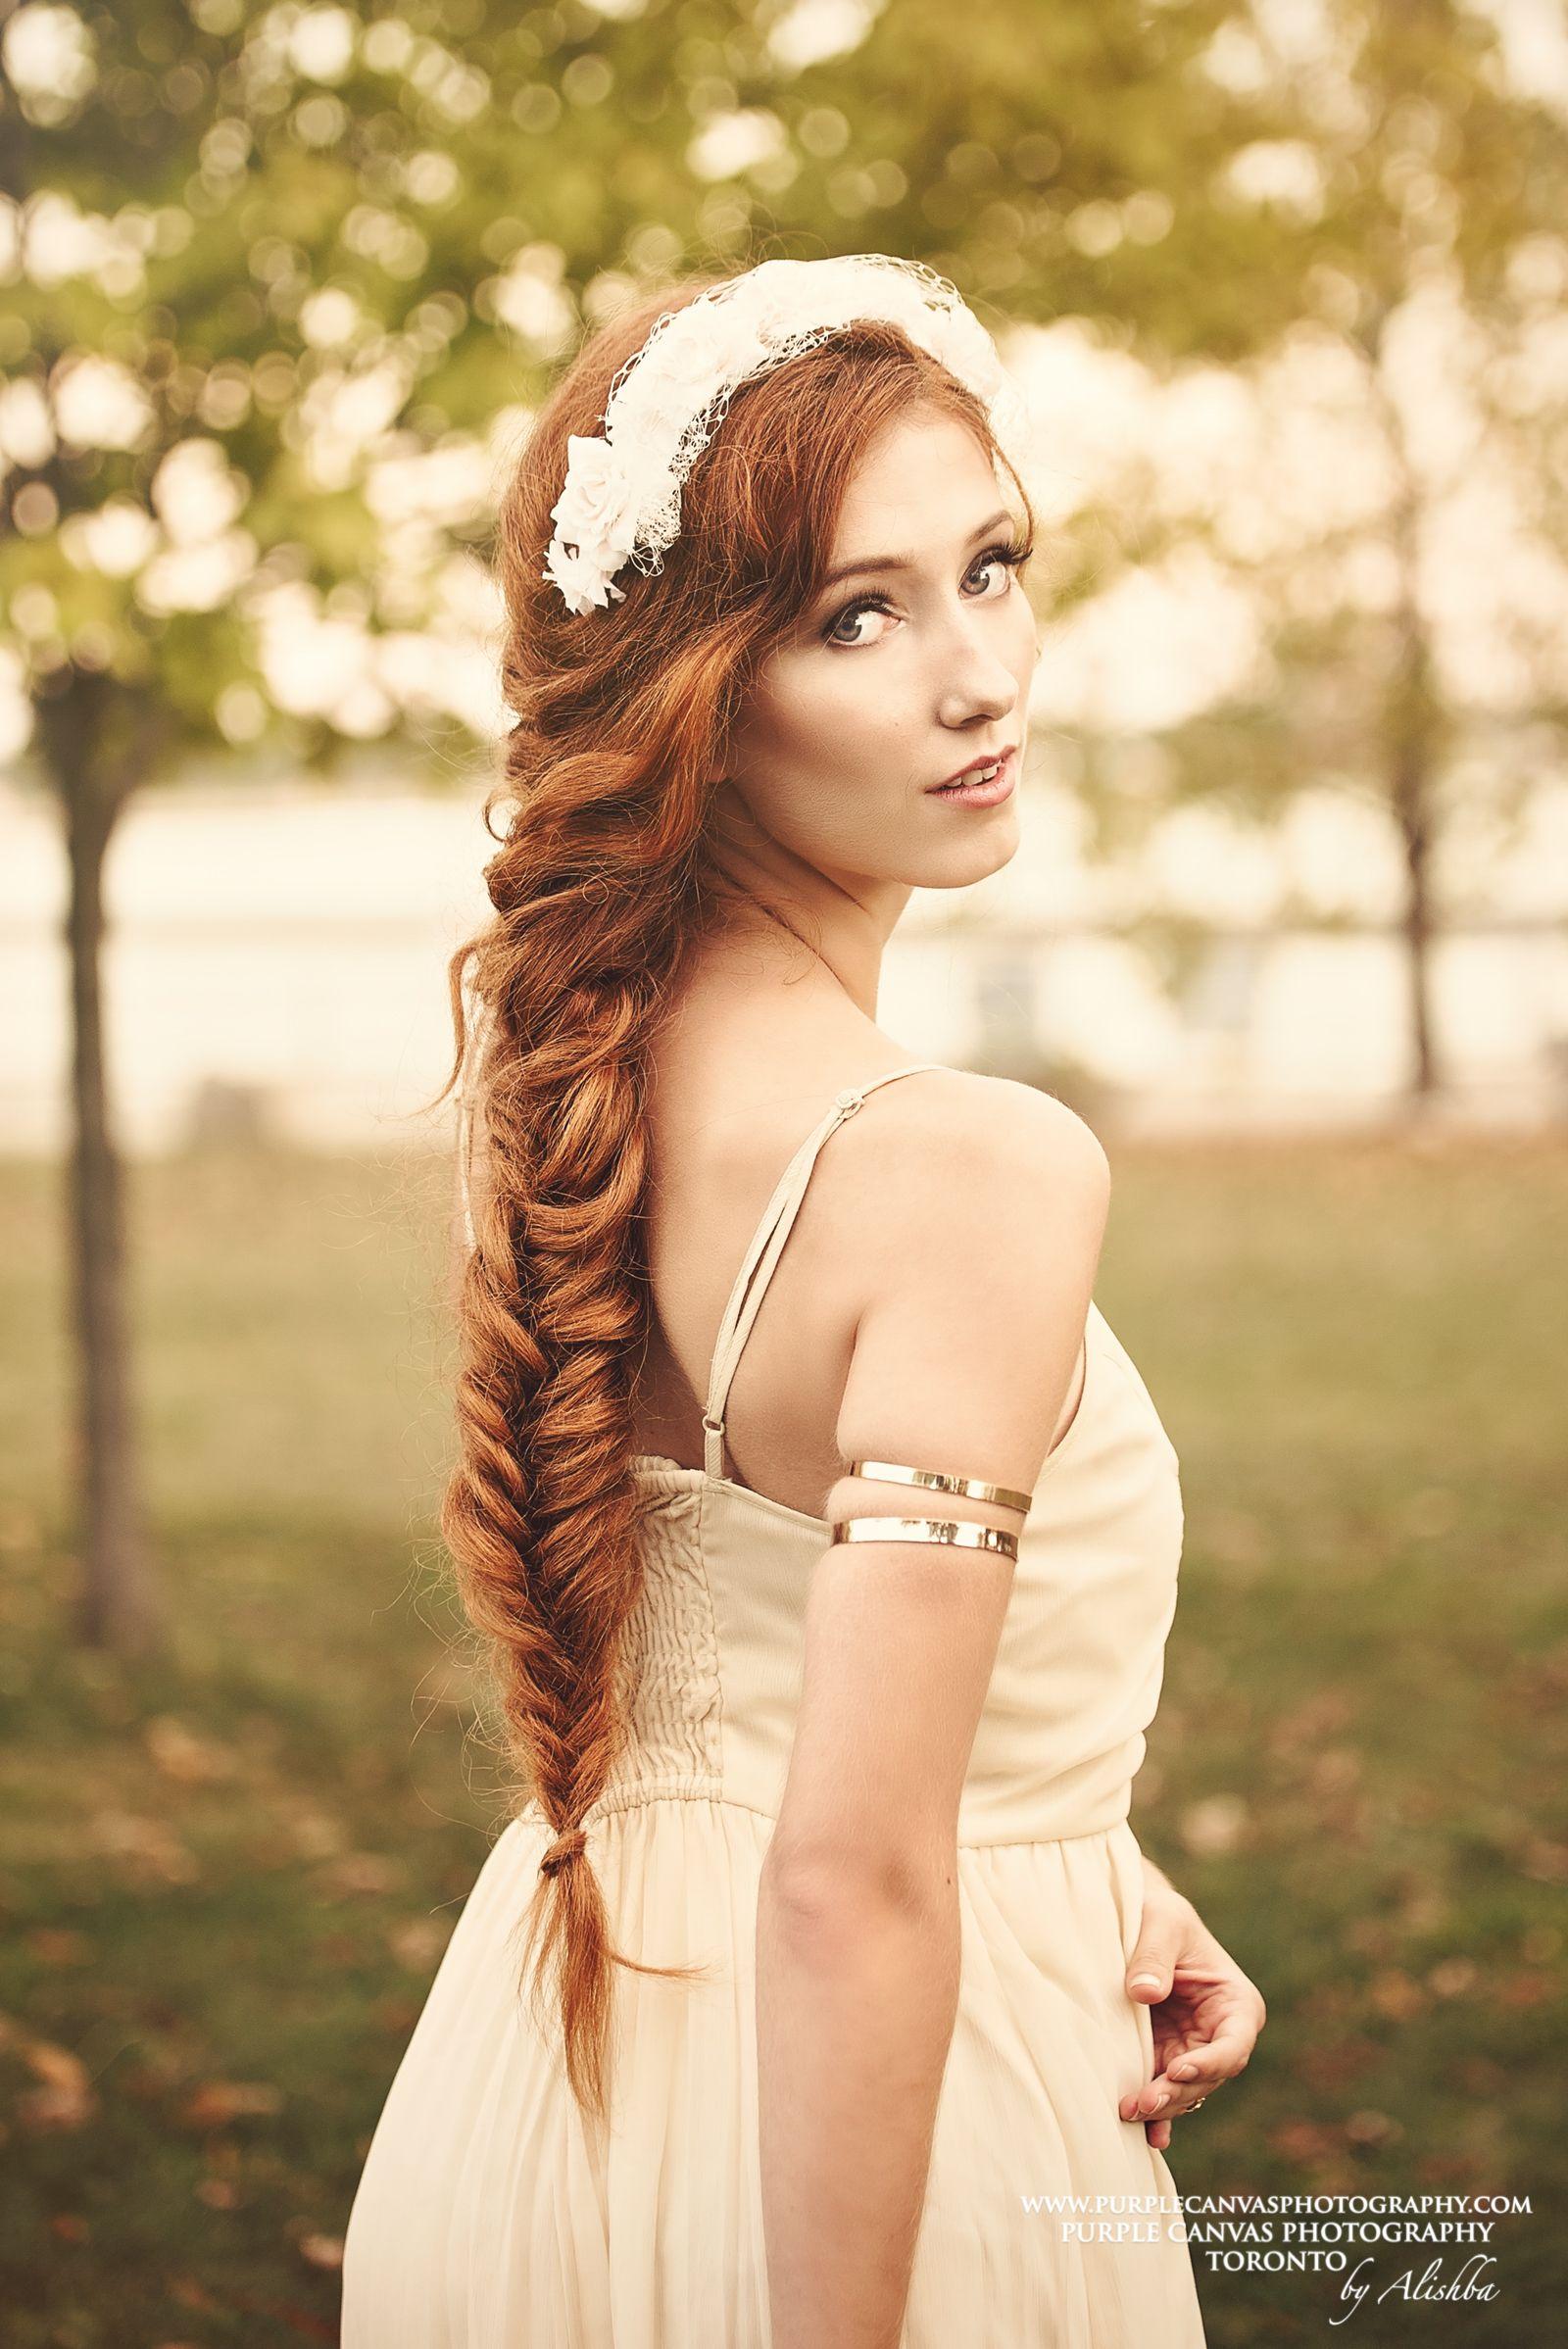 makeup artist: faced mua stylist: svitlana skiba photographer